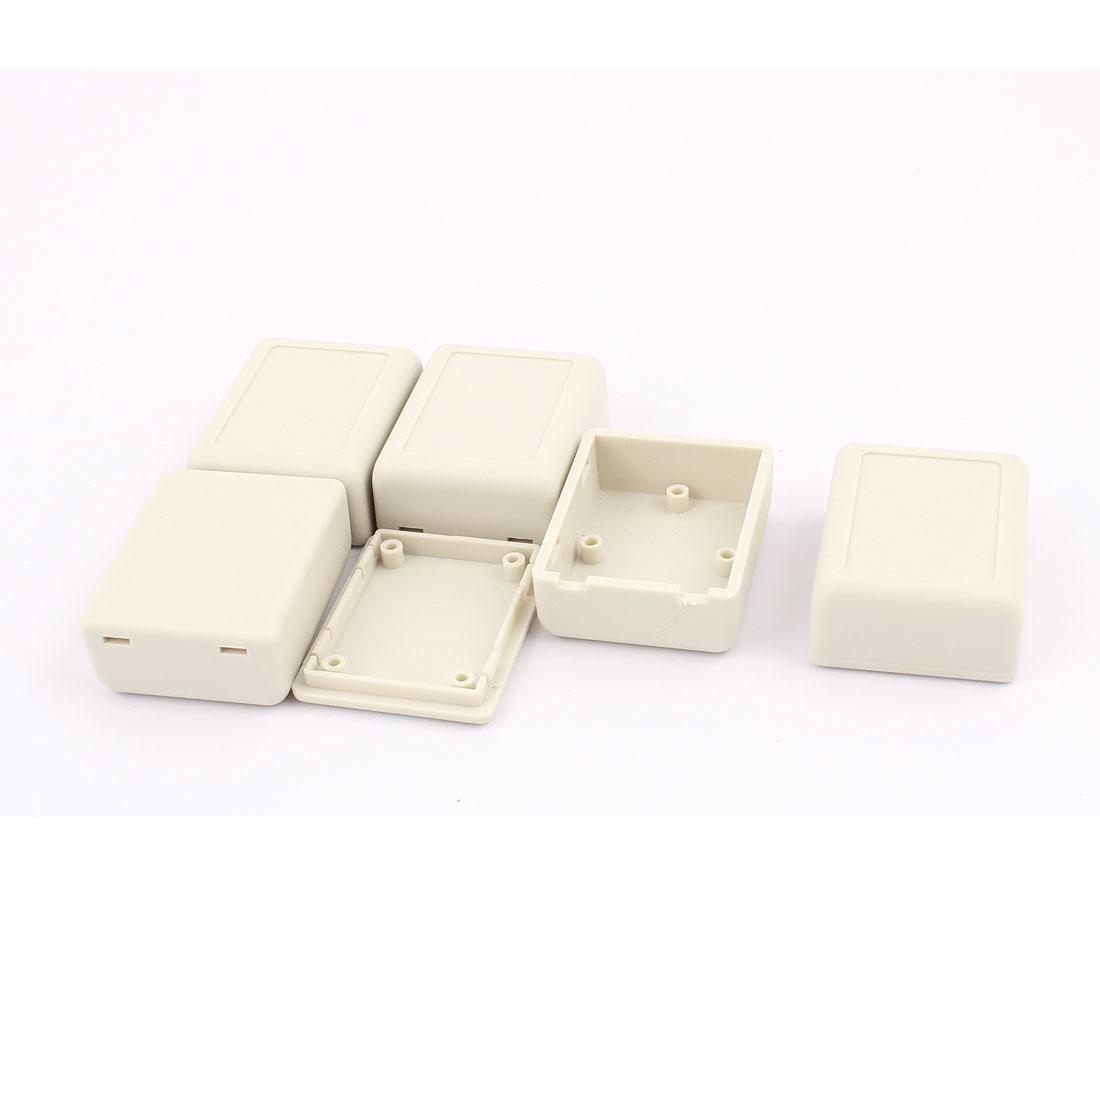 46x36x18mm Dustproof IP65 Plastic Enclosure Case DIY Junction Box 5Pcs